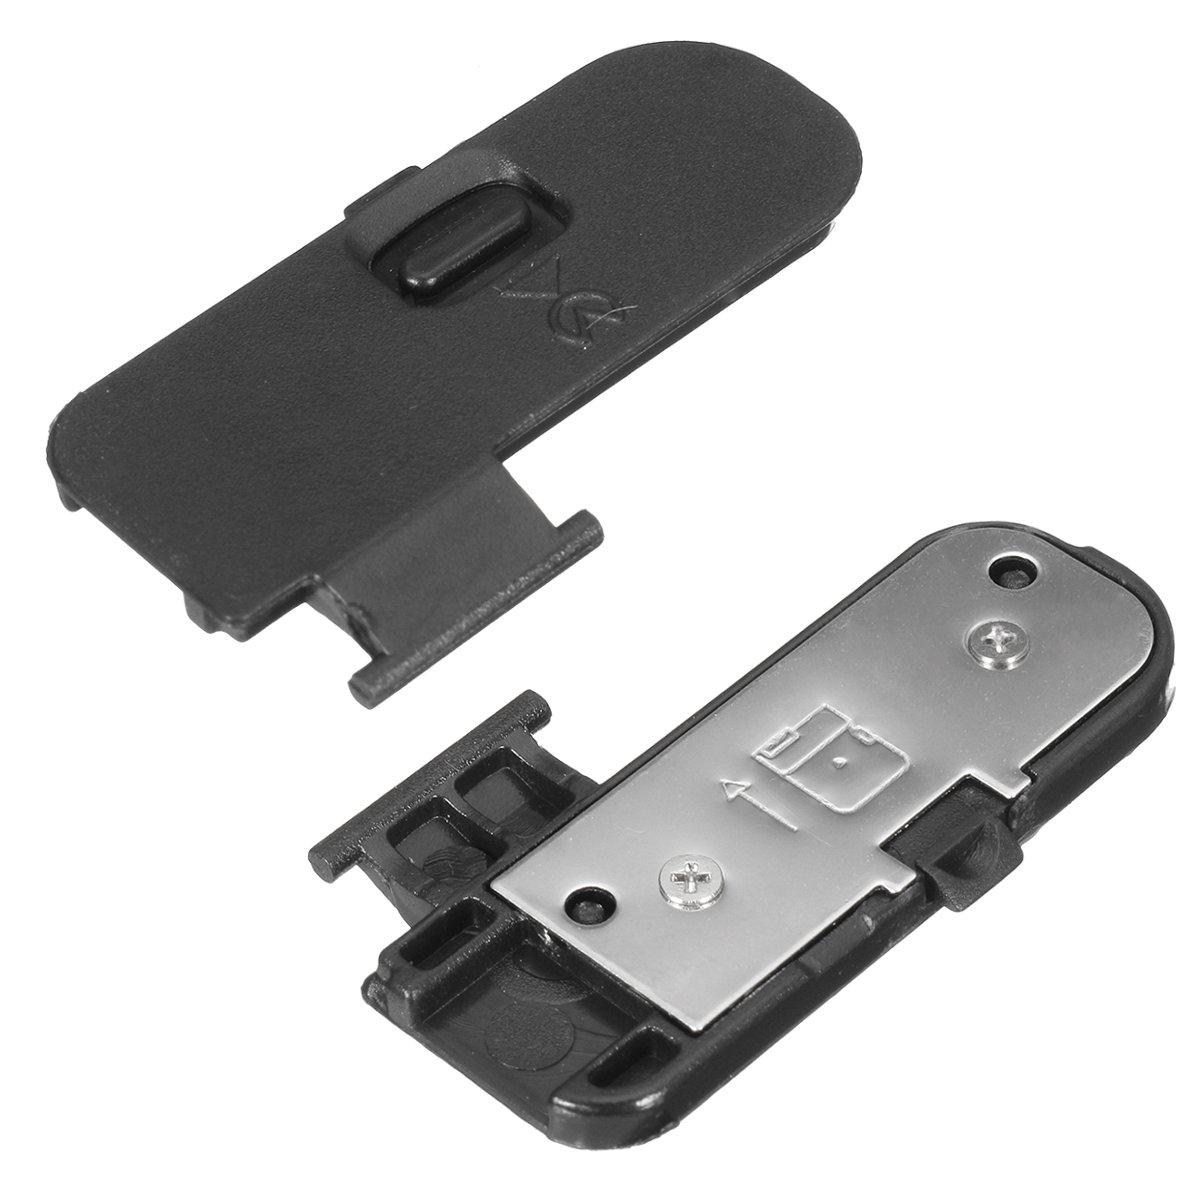 Buy Battery Door Cover Lid Cap Repair Replacement Part Plastic For D3200 D3300